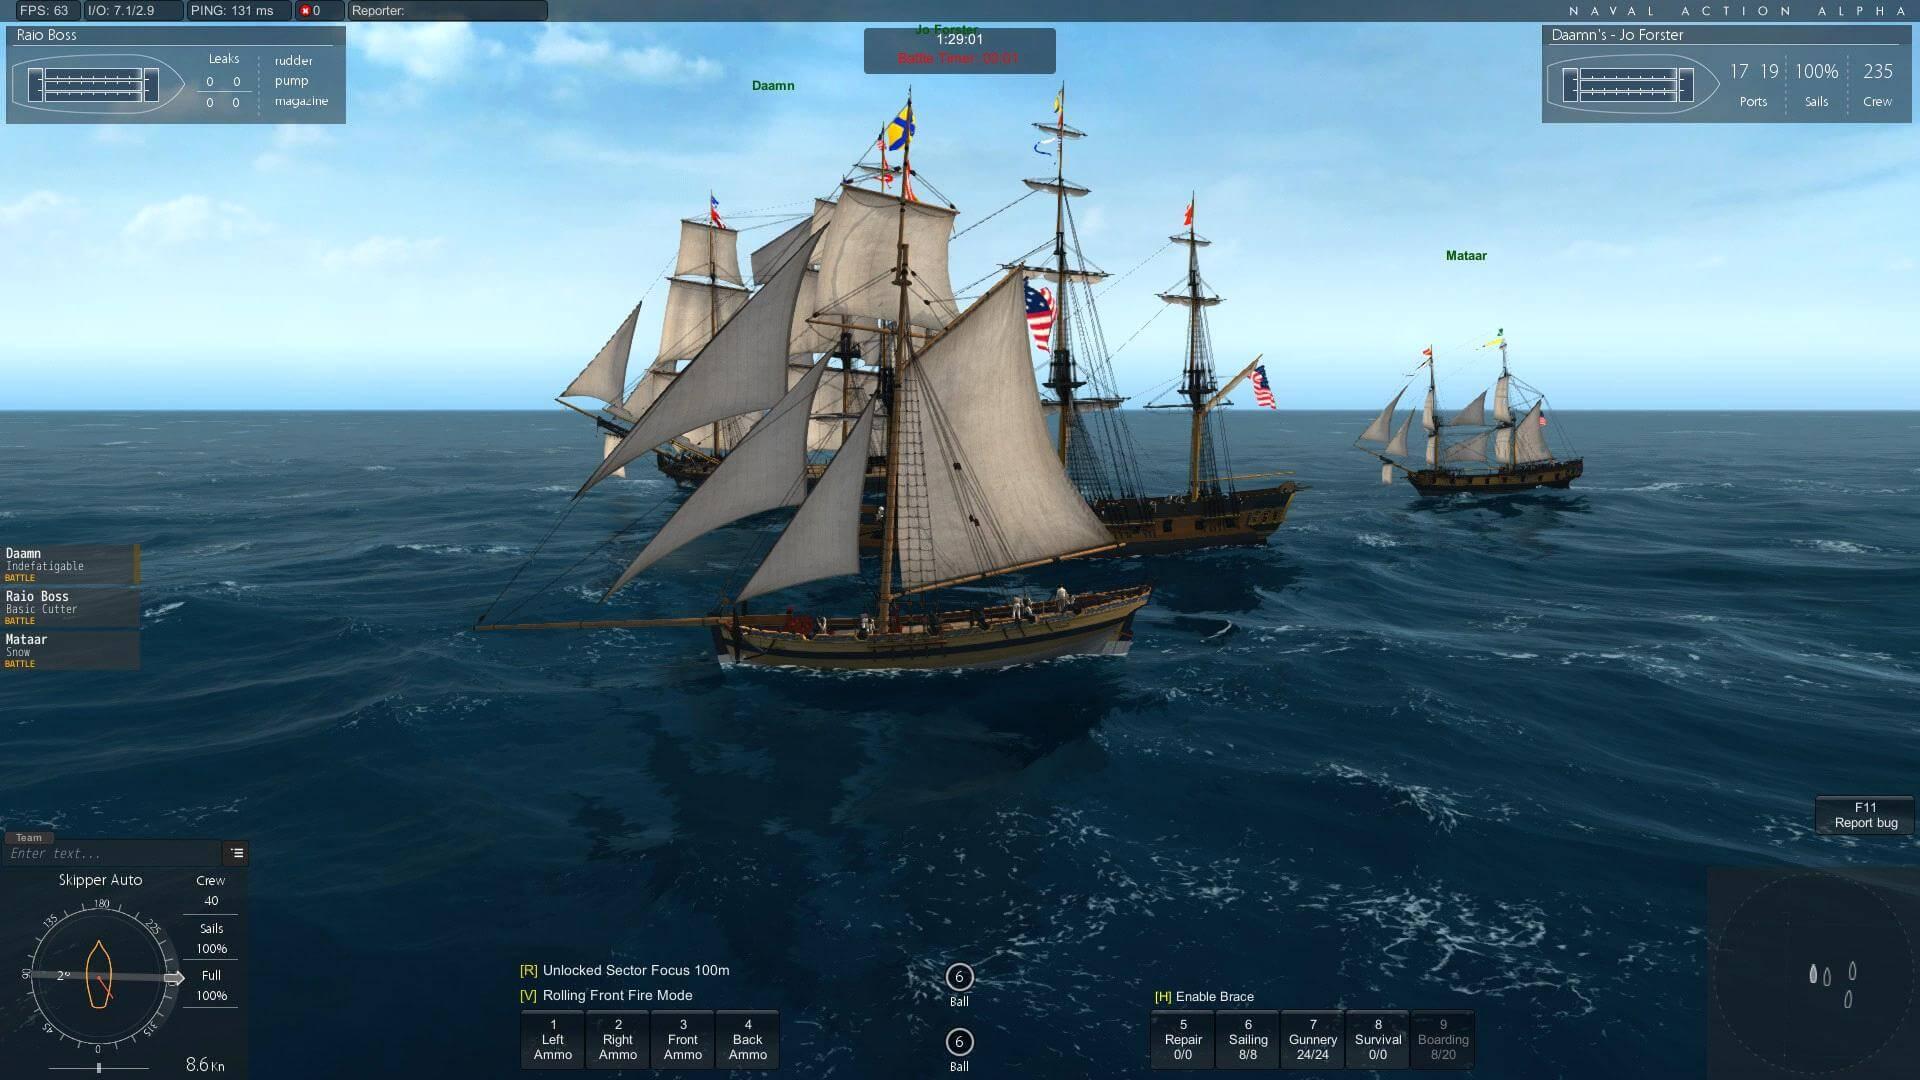 naval action navi team